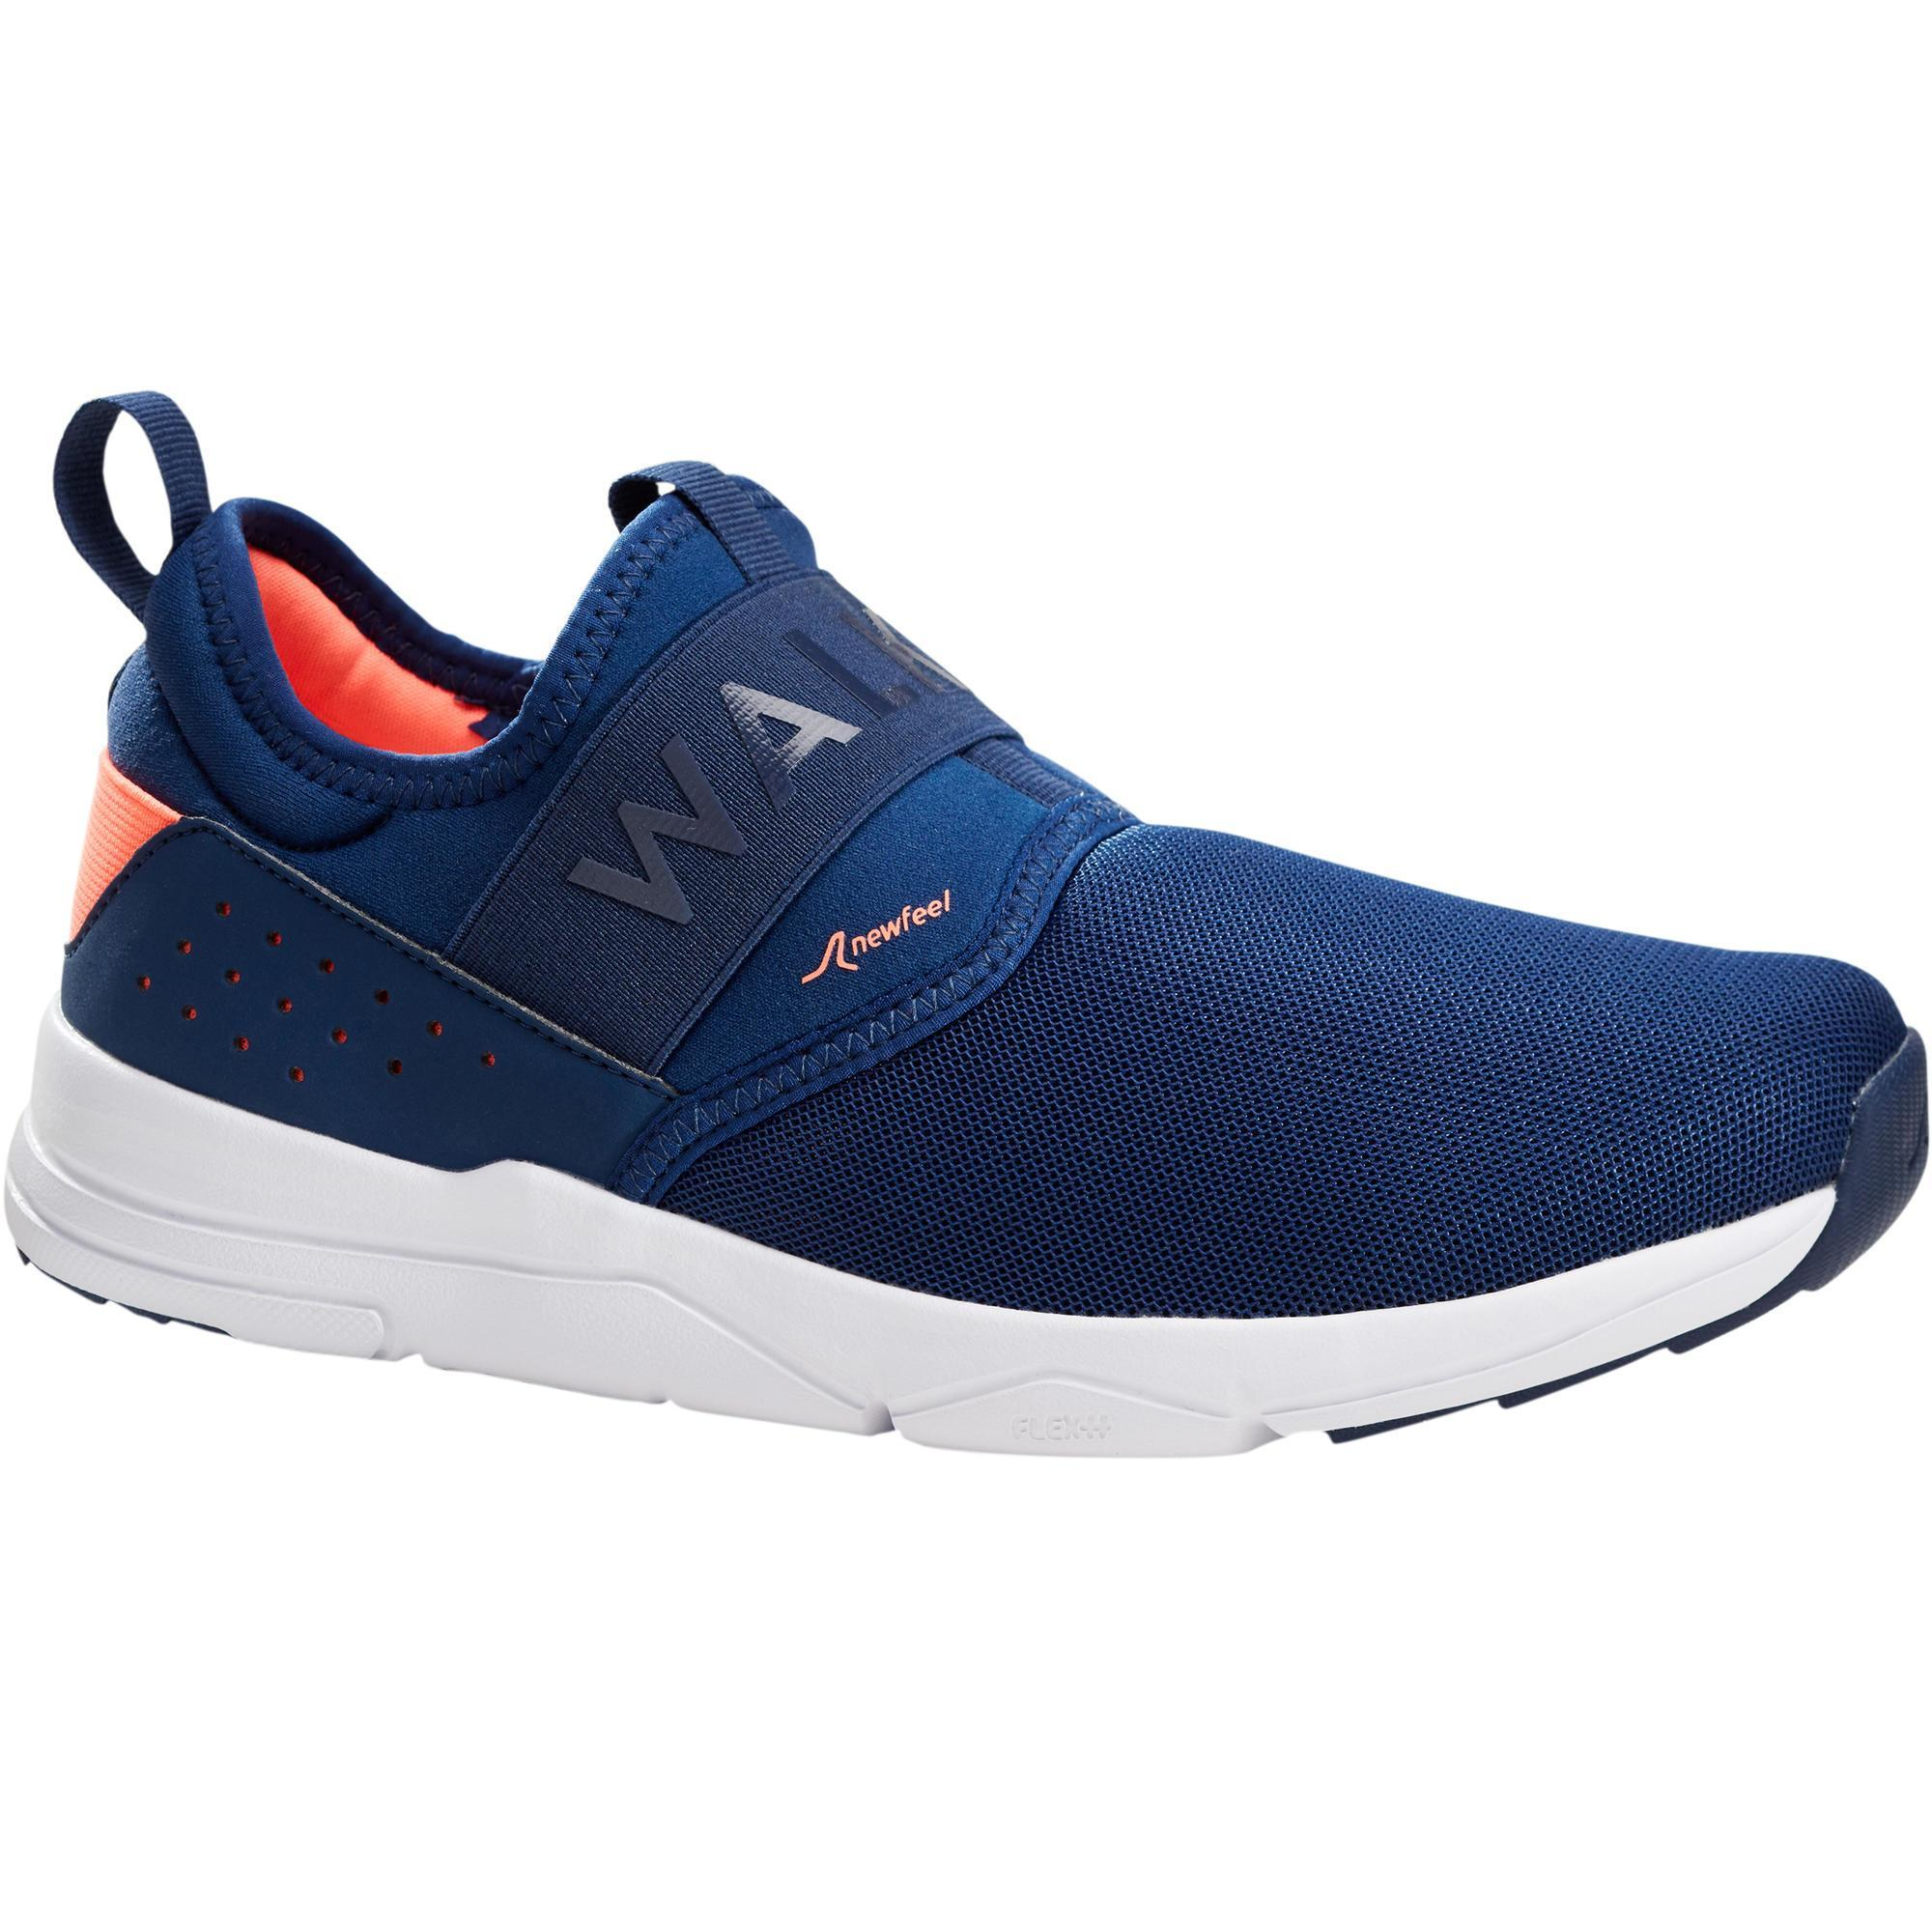 Chaussures marche sportive femme PW 160 Slip On marine - Newfeel